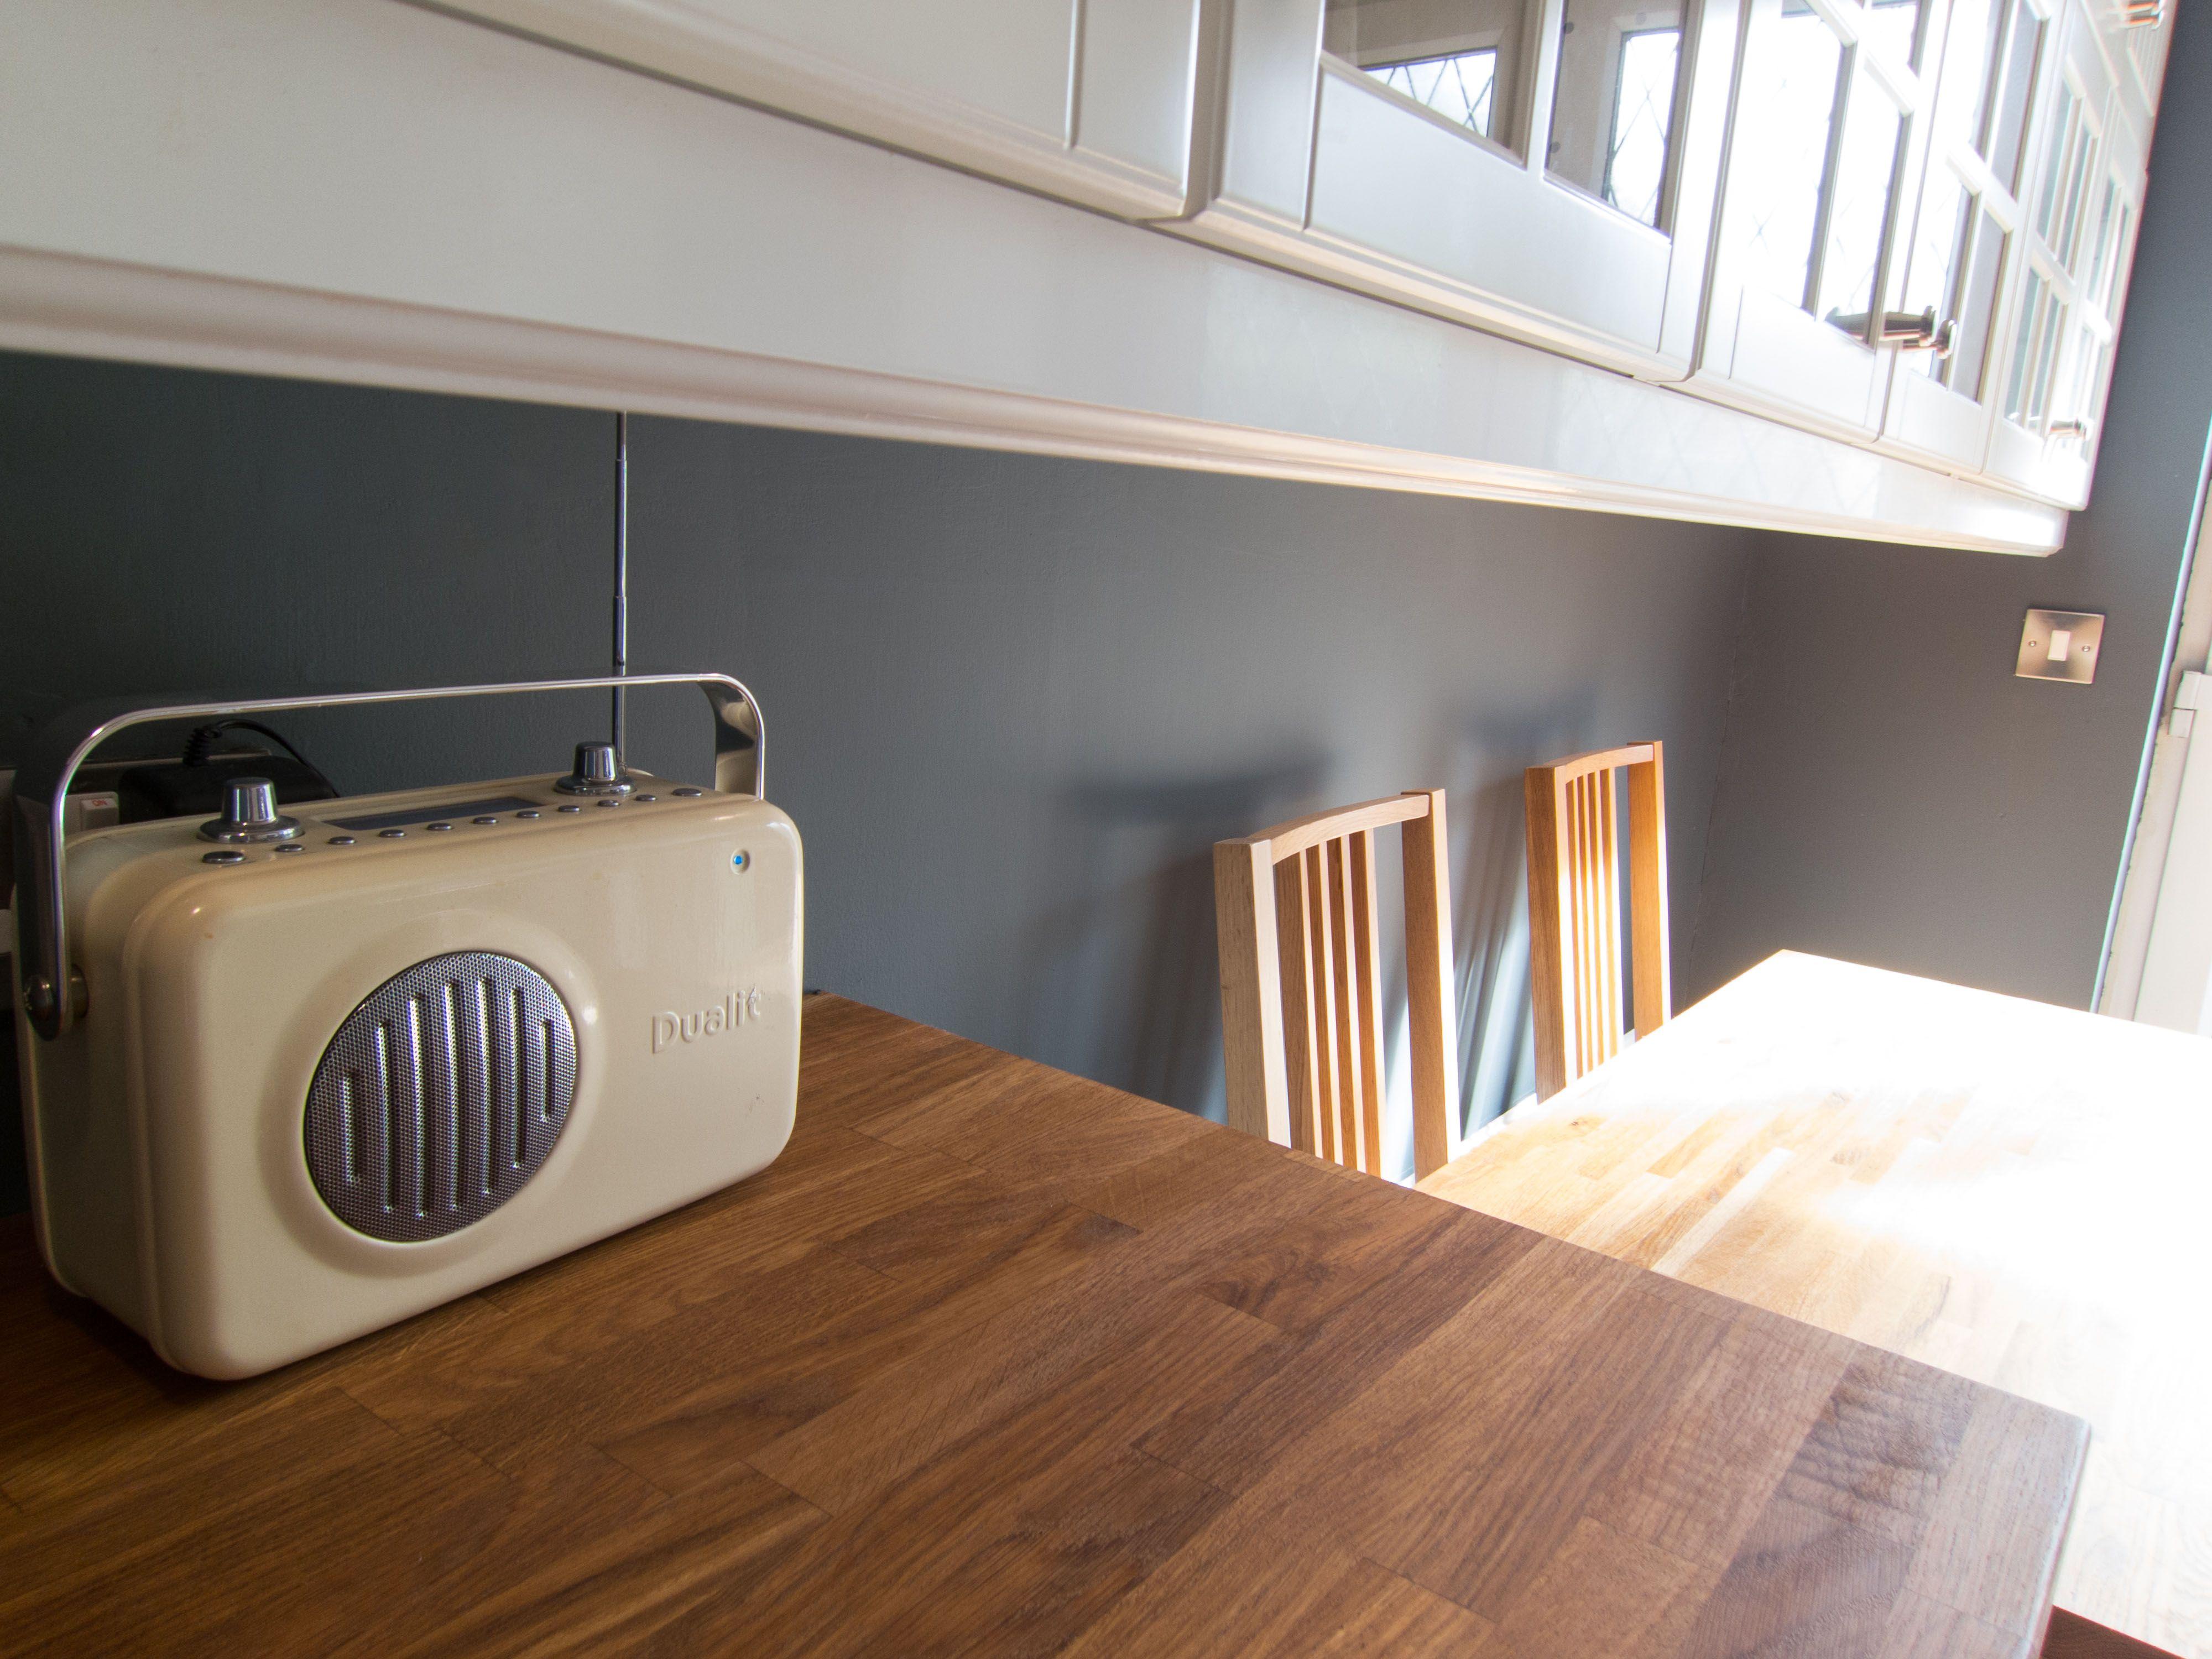 My kitchen Farrow & Ball Down Pipe no 26 walls Dualit DAB radio